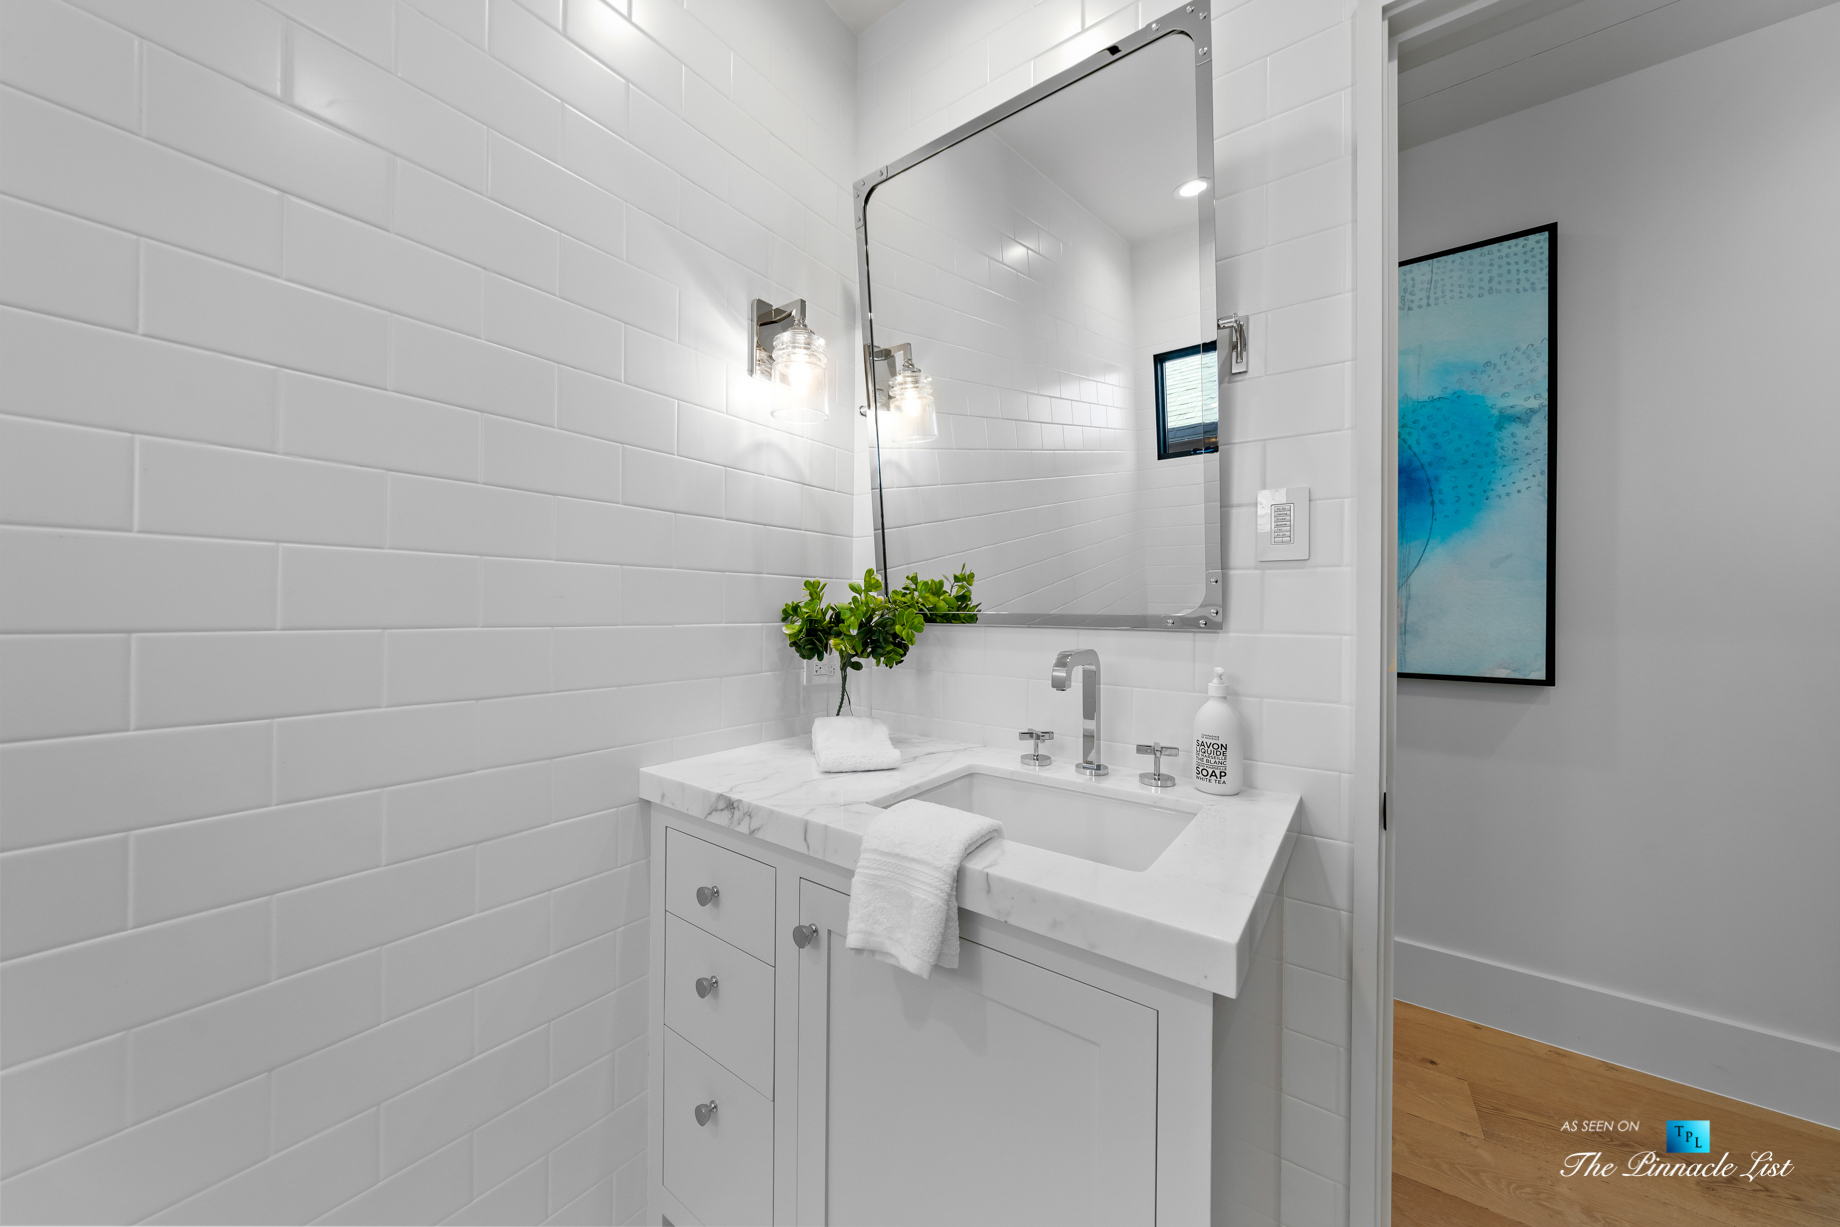 508 The Strand, Manhattan Beach, CA, USA - Lower Level Bathroom - Luxury Real Estate - Oceanfront Home